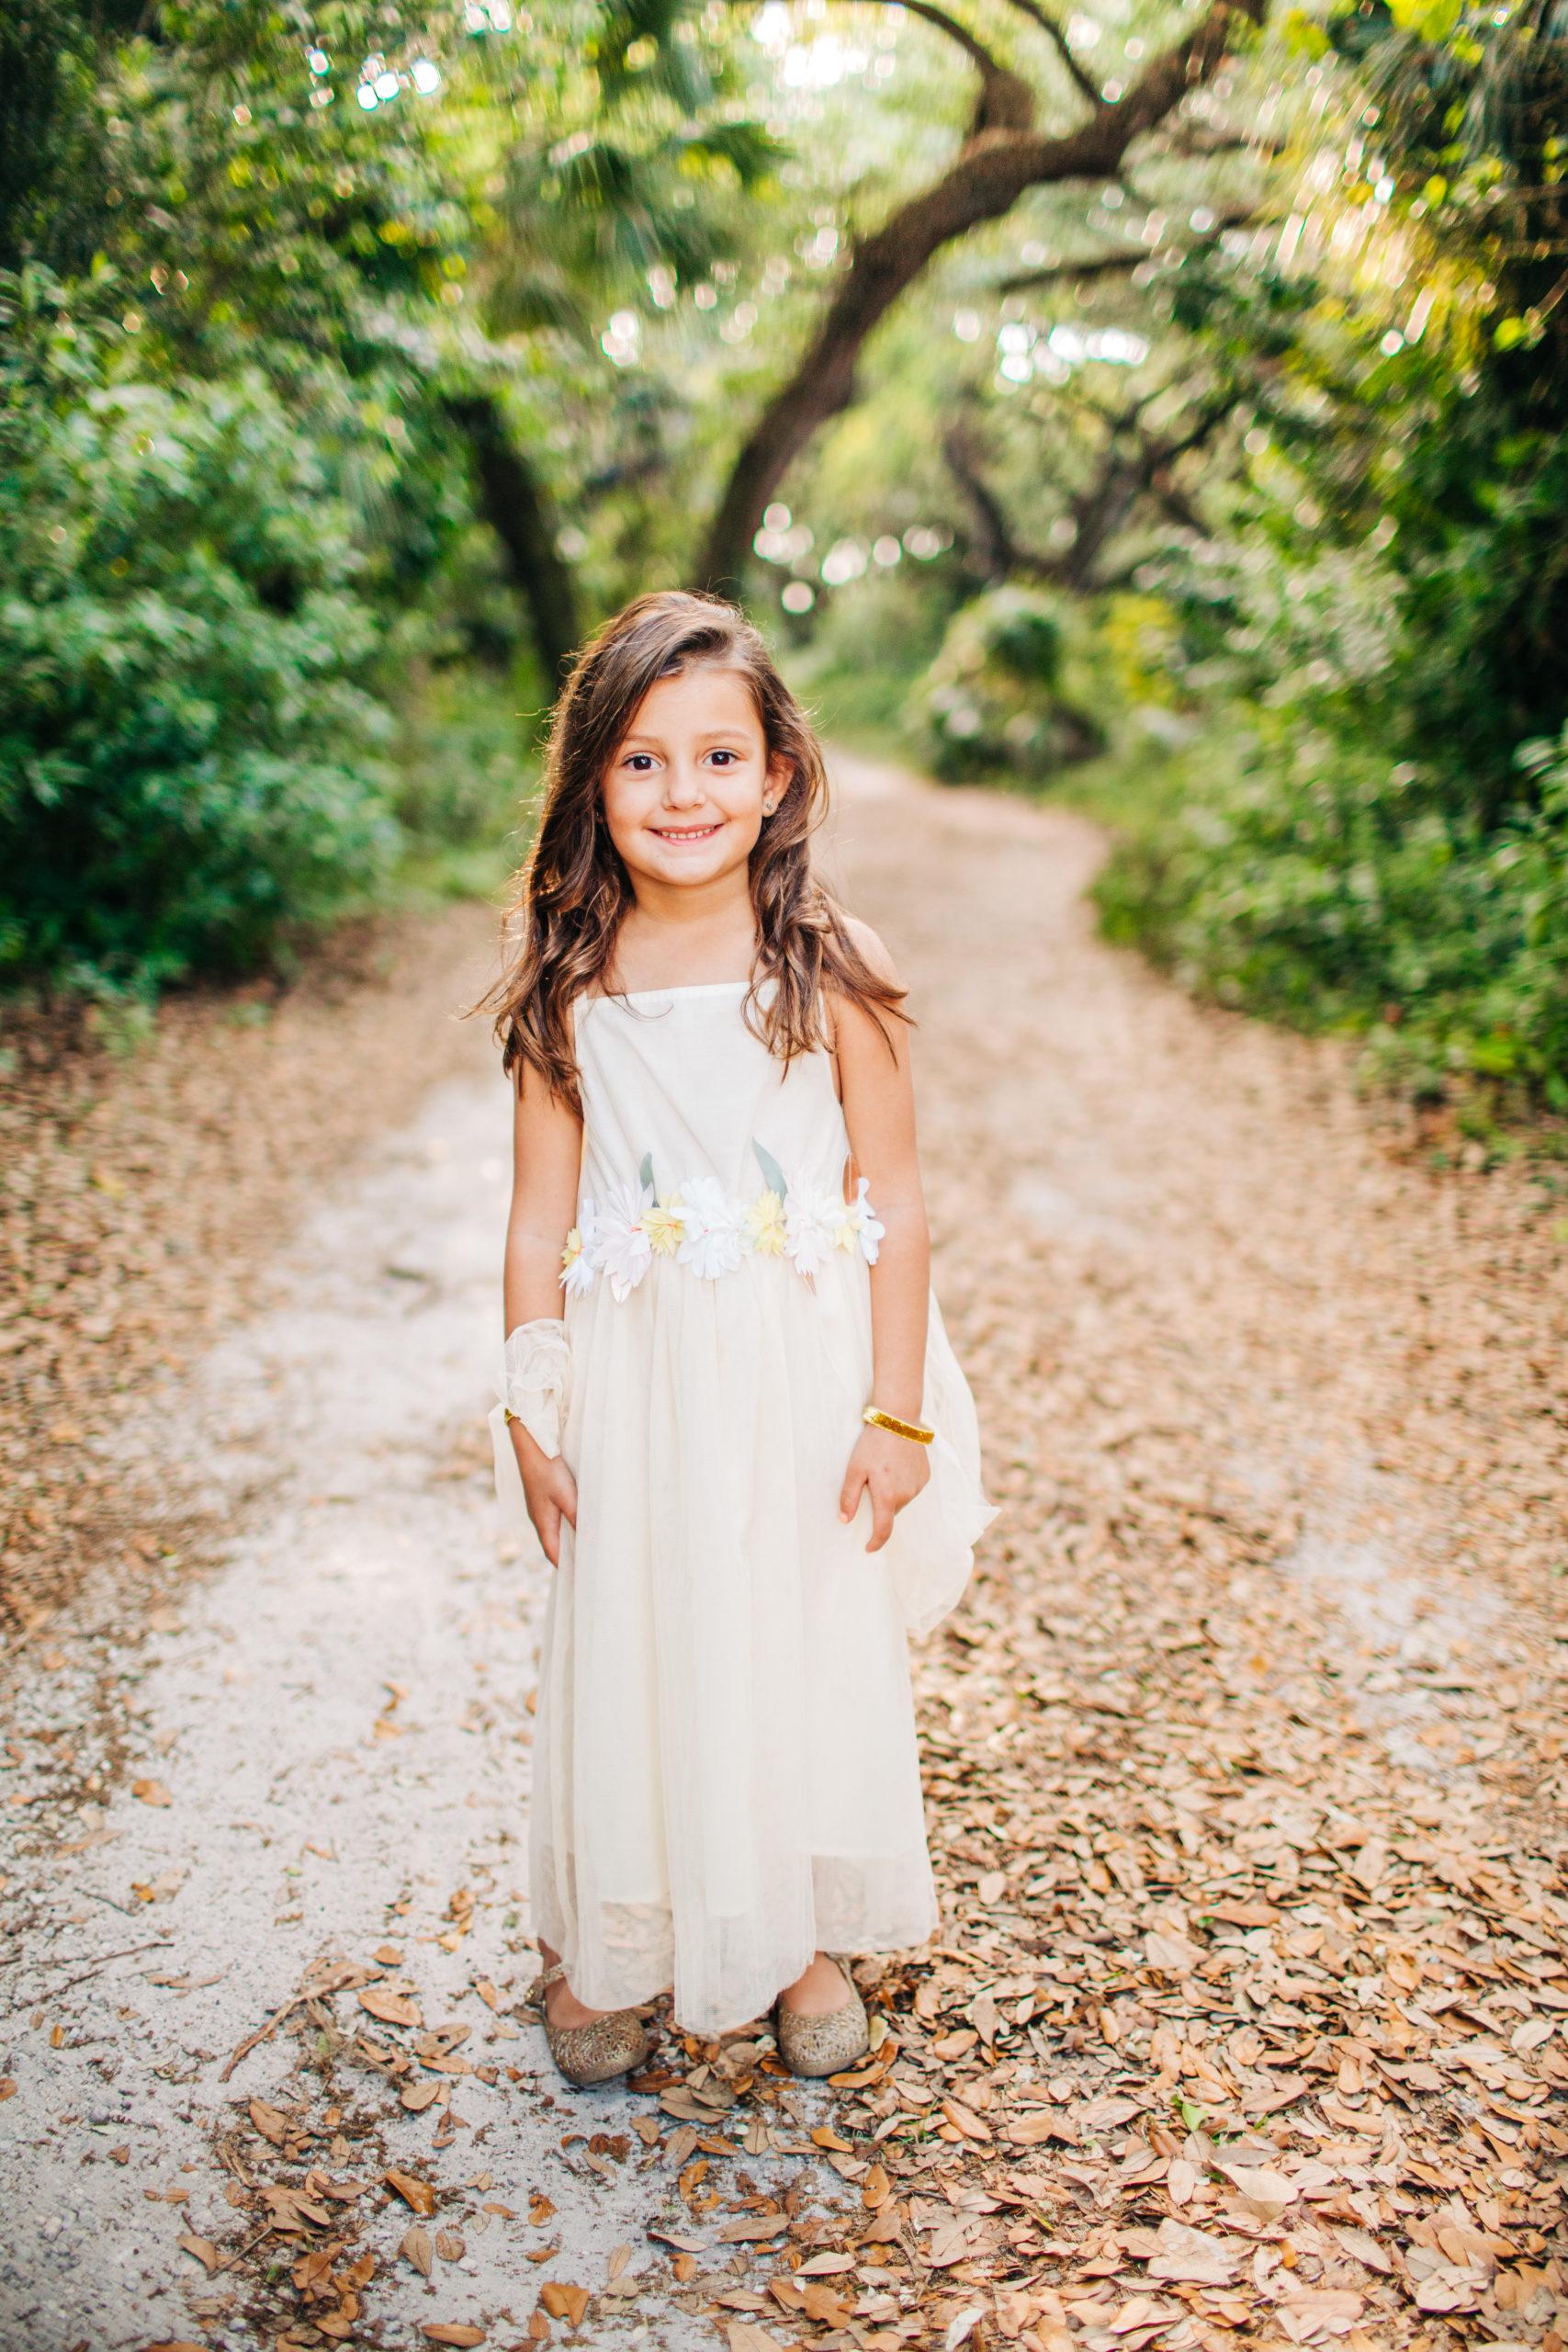 ChildrenPortraits_Lola-3-scaled Miami's 8 best Photoshoot Locations